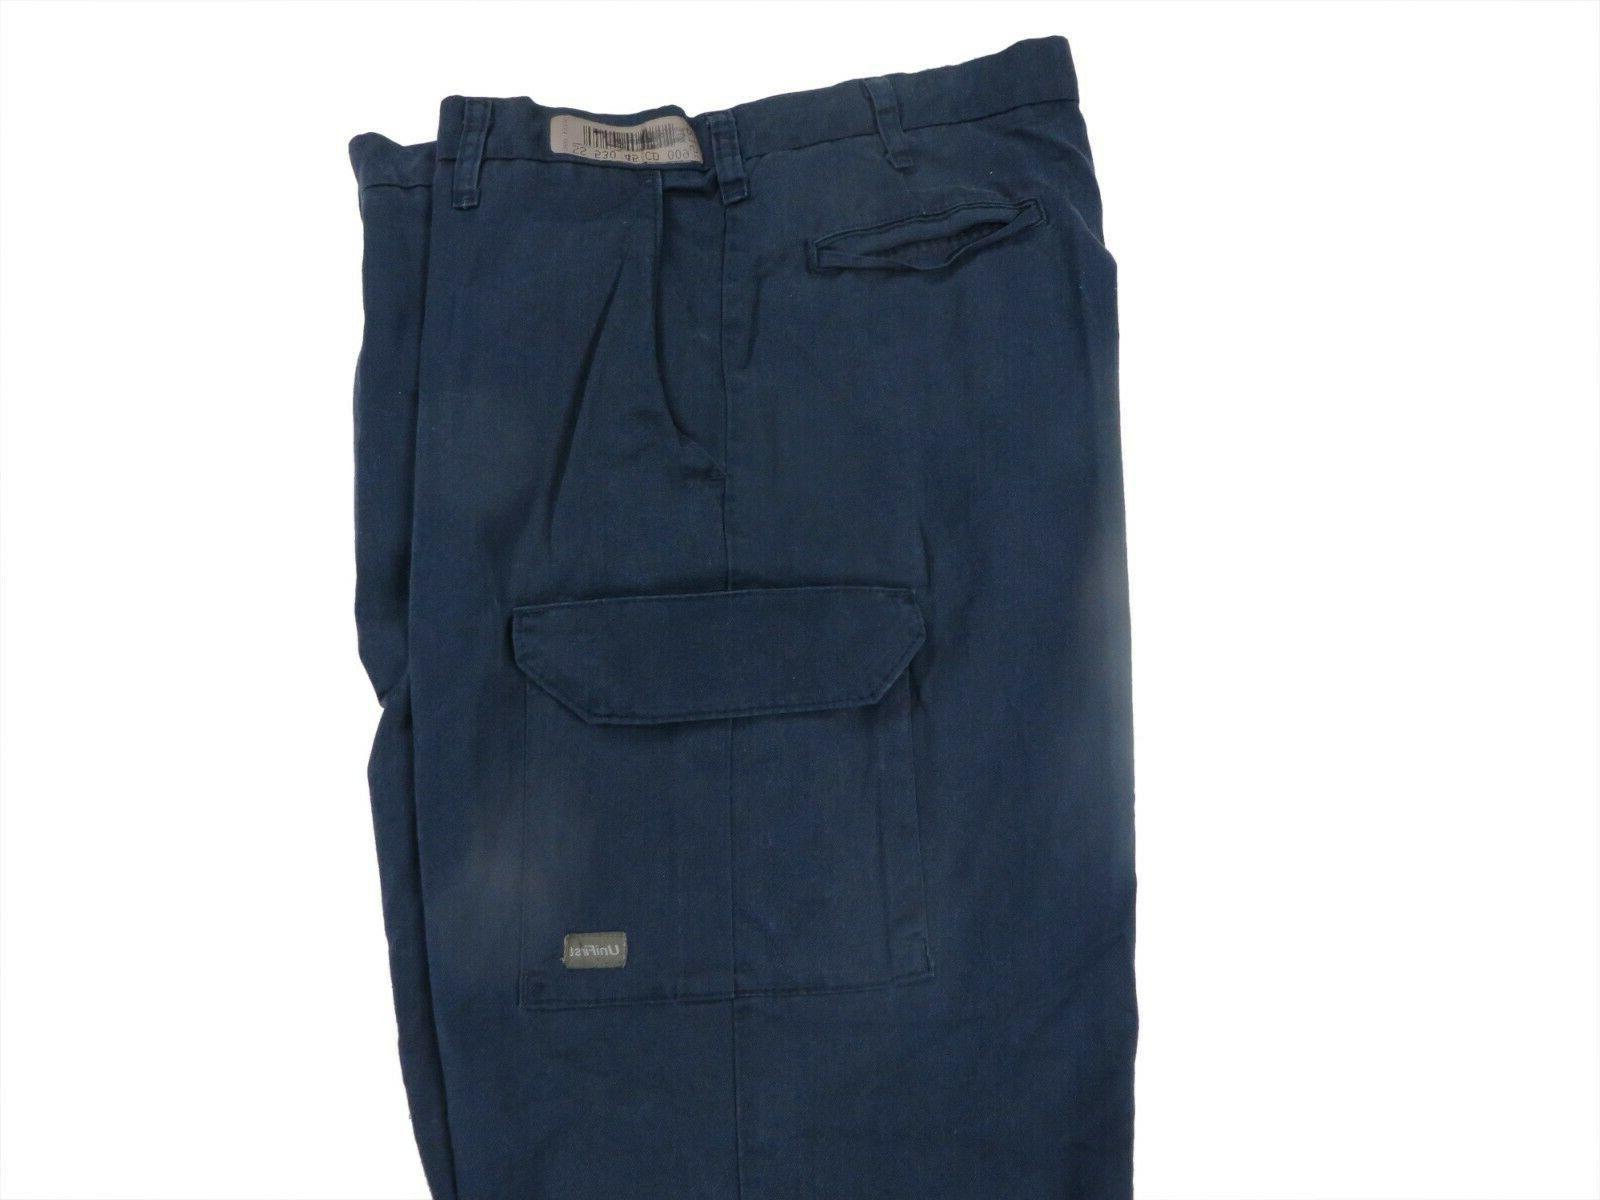 Cargo Work Pants Used Cintas Unifirst Dickies Redkap Black Tan